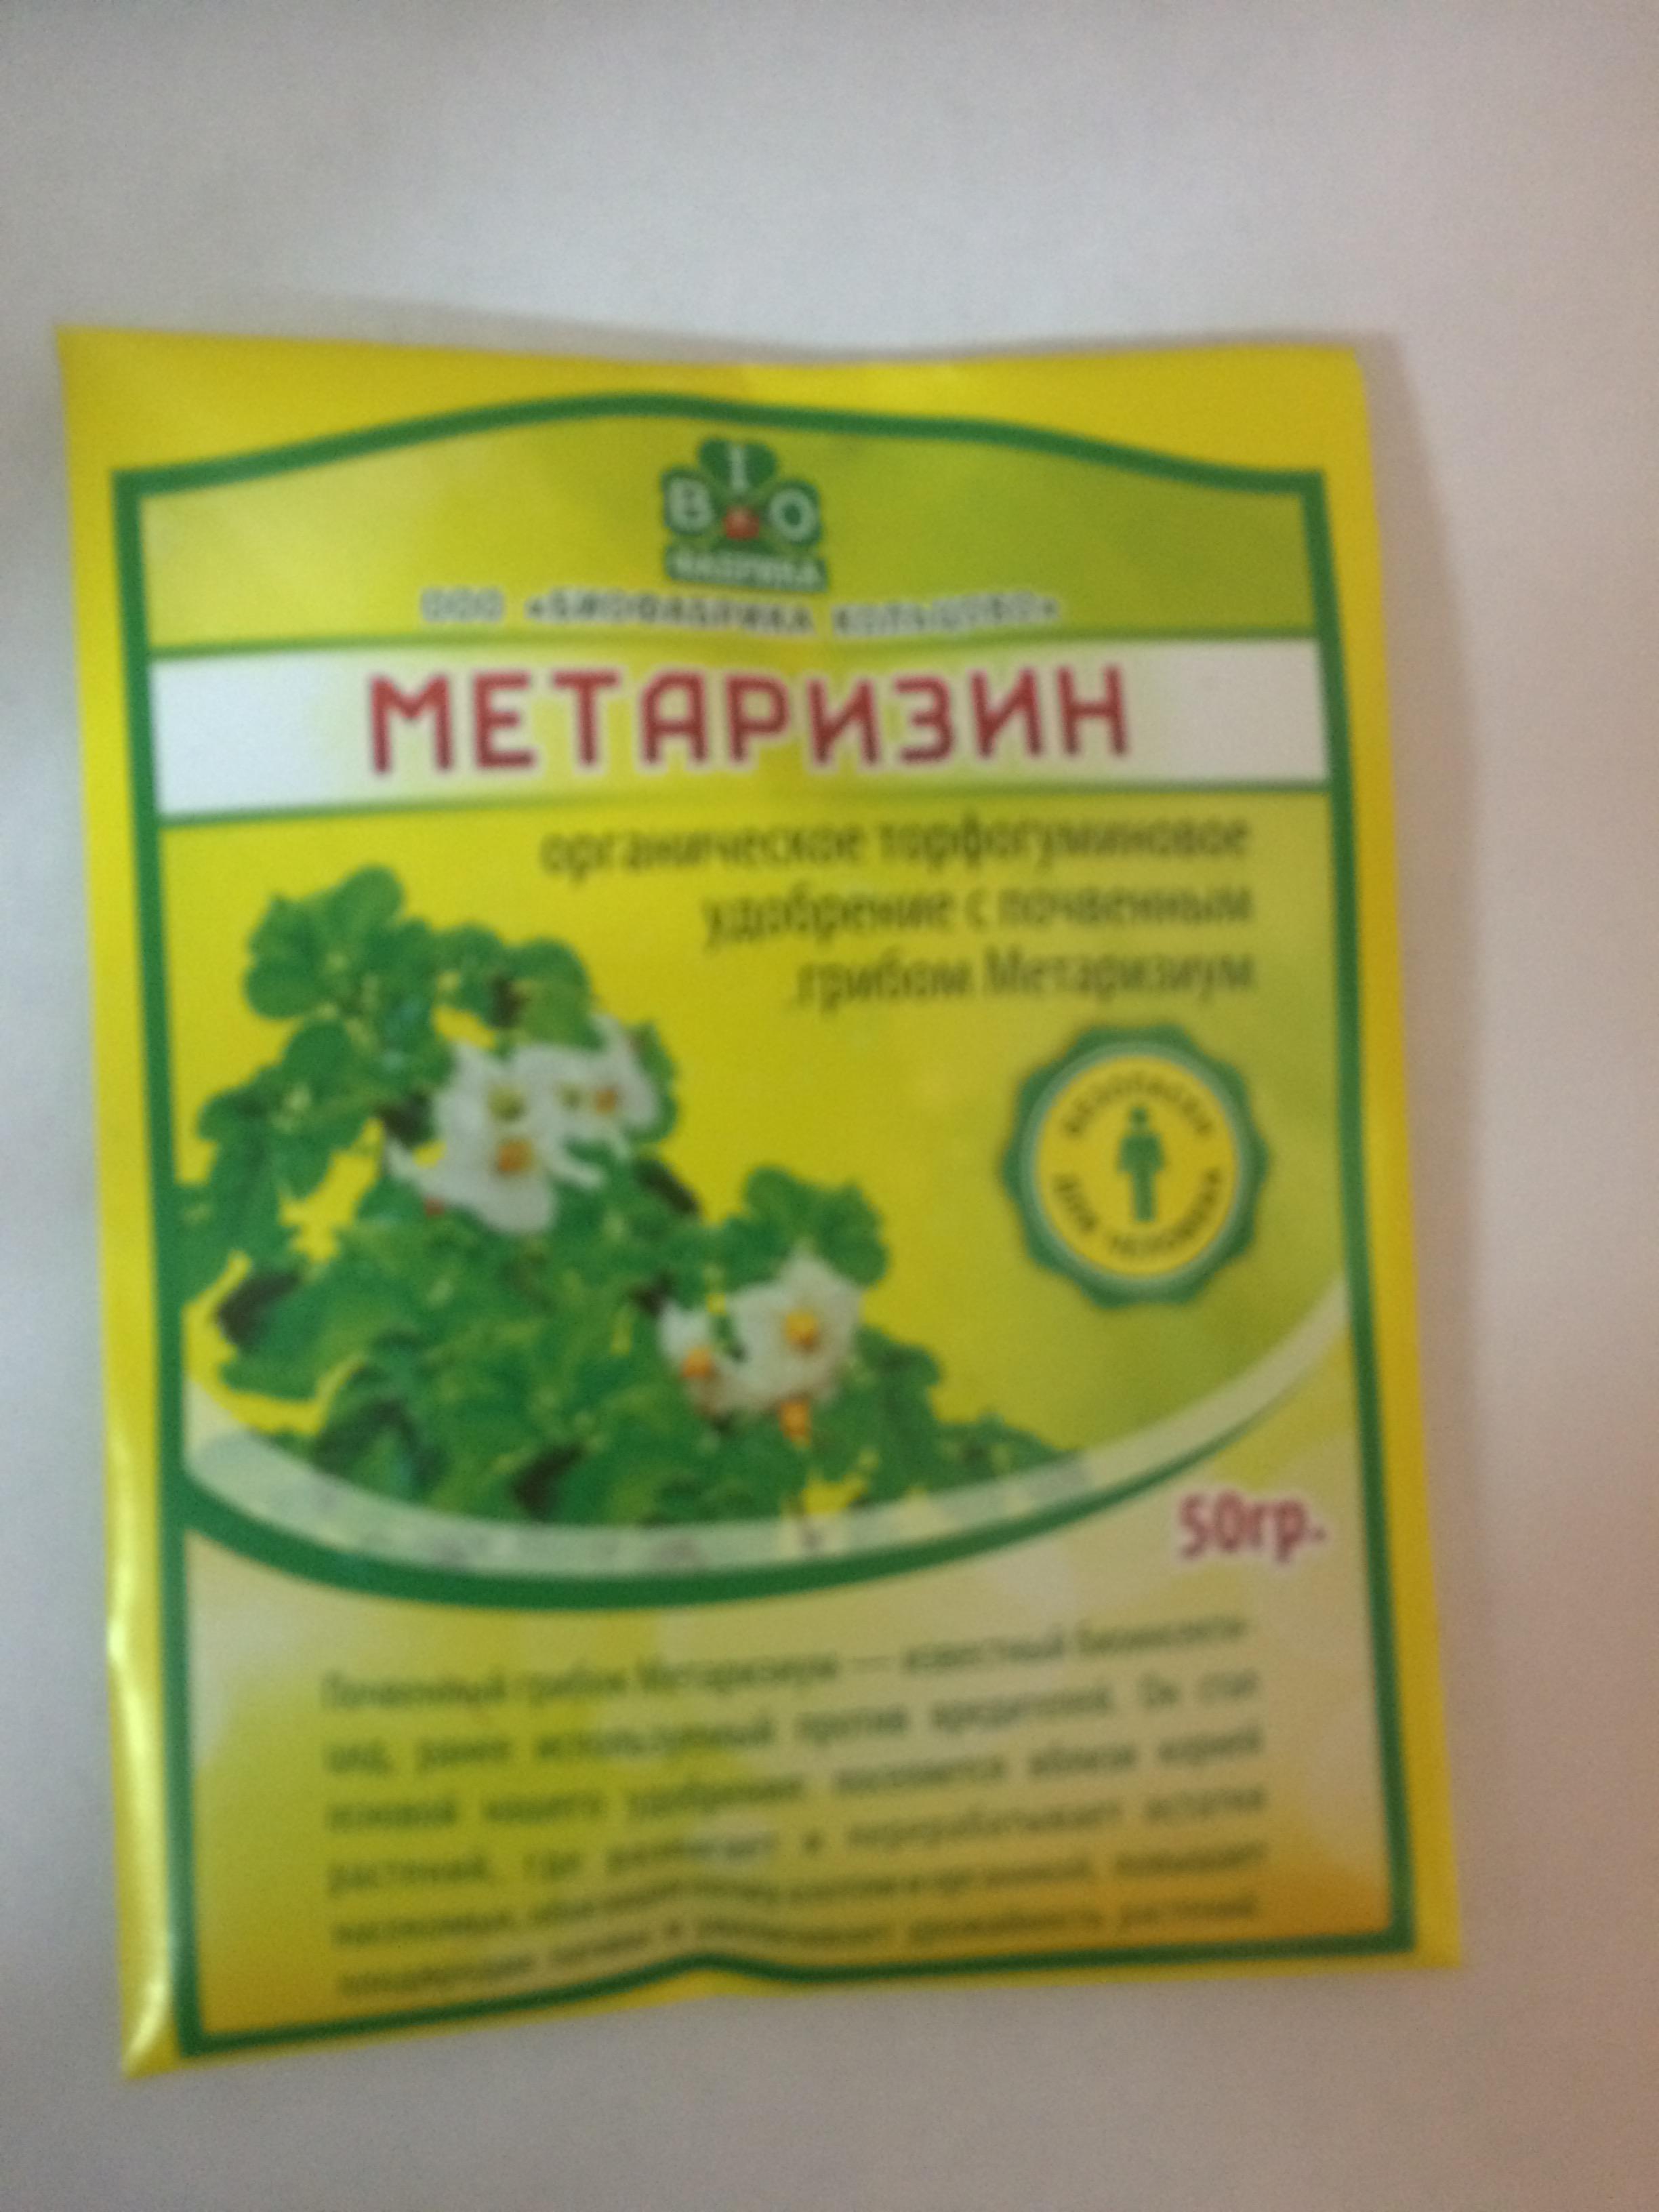 metarizin-50-g